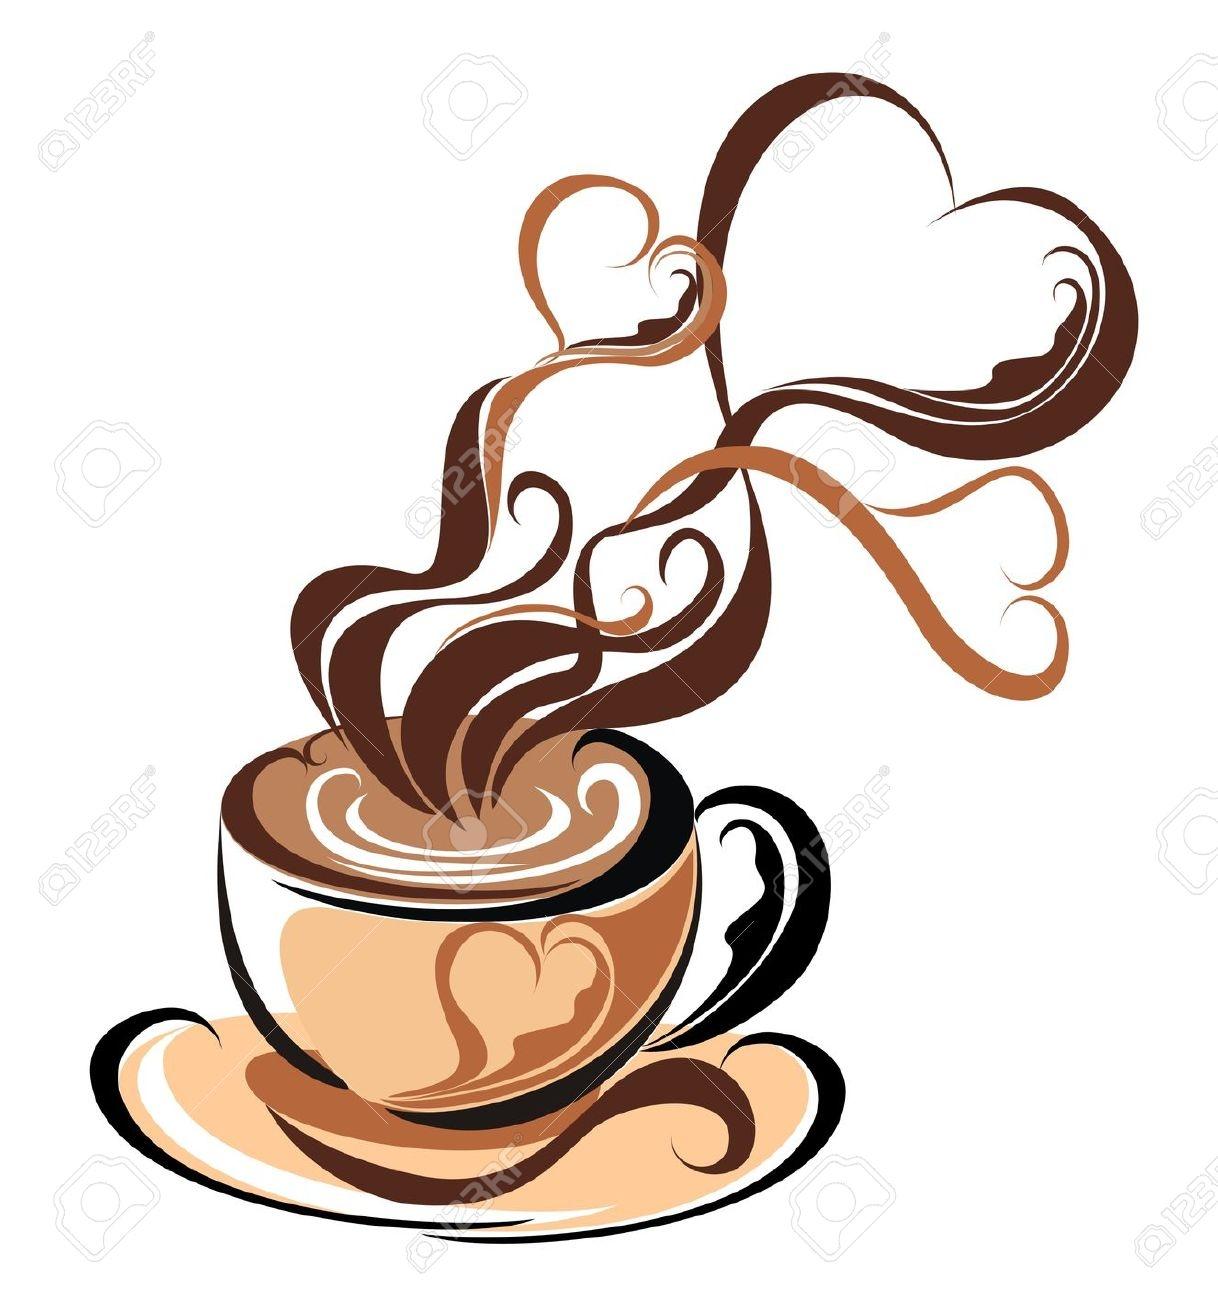 Coffee Mug With Heart PNG - 79520